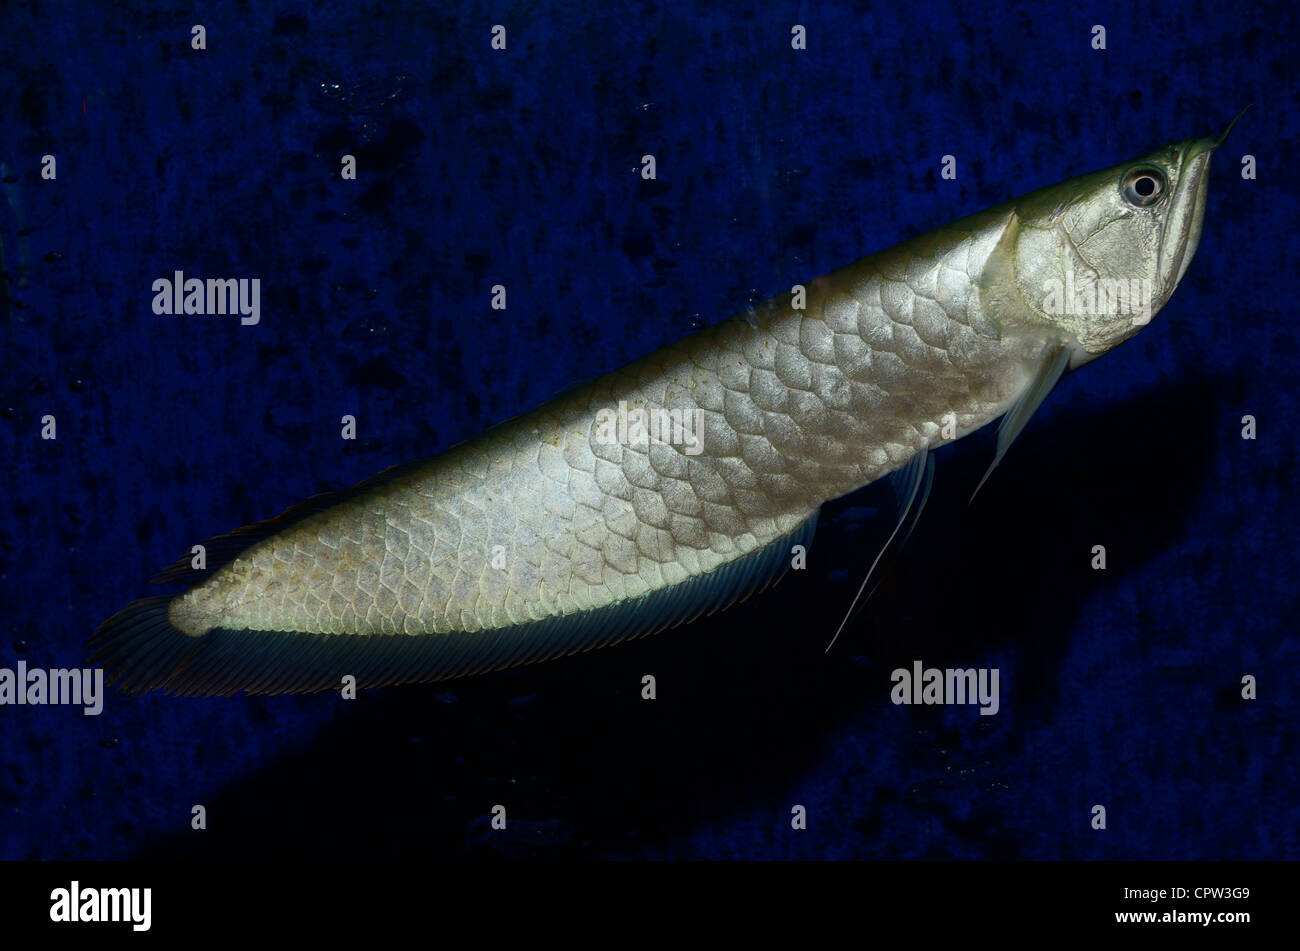 Silver Arowana freshwater bonytongue fish from the Amazon river swimming in an aquarium - Stock Image